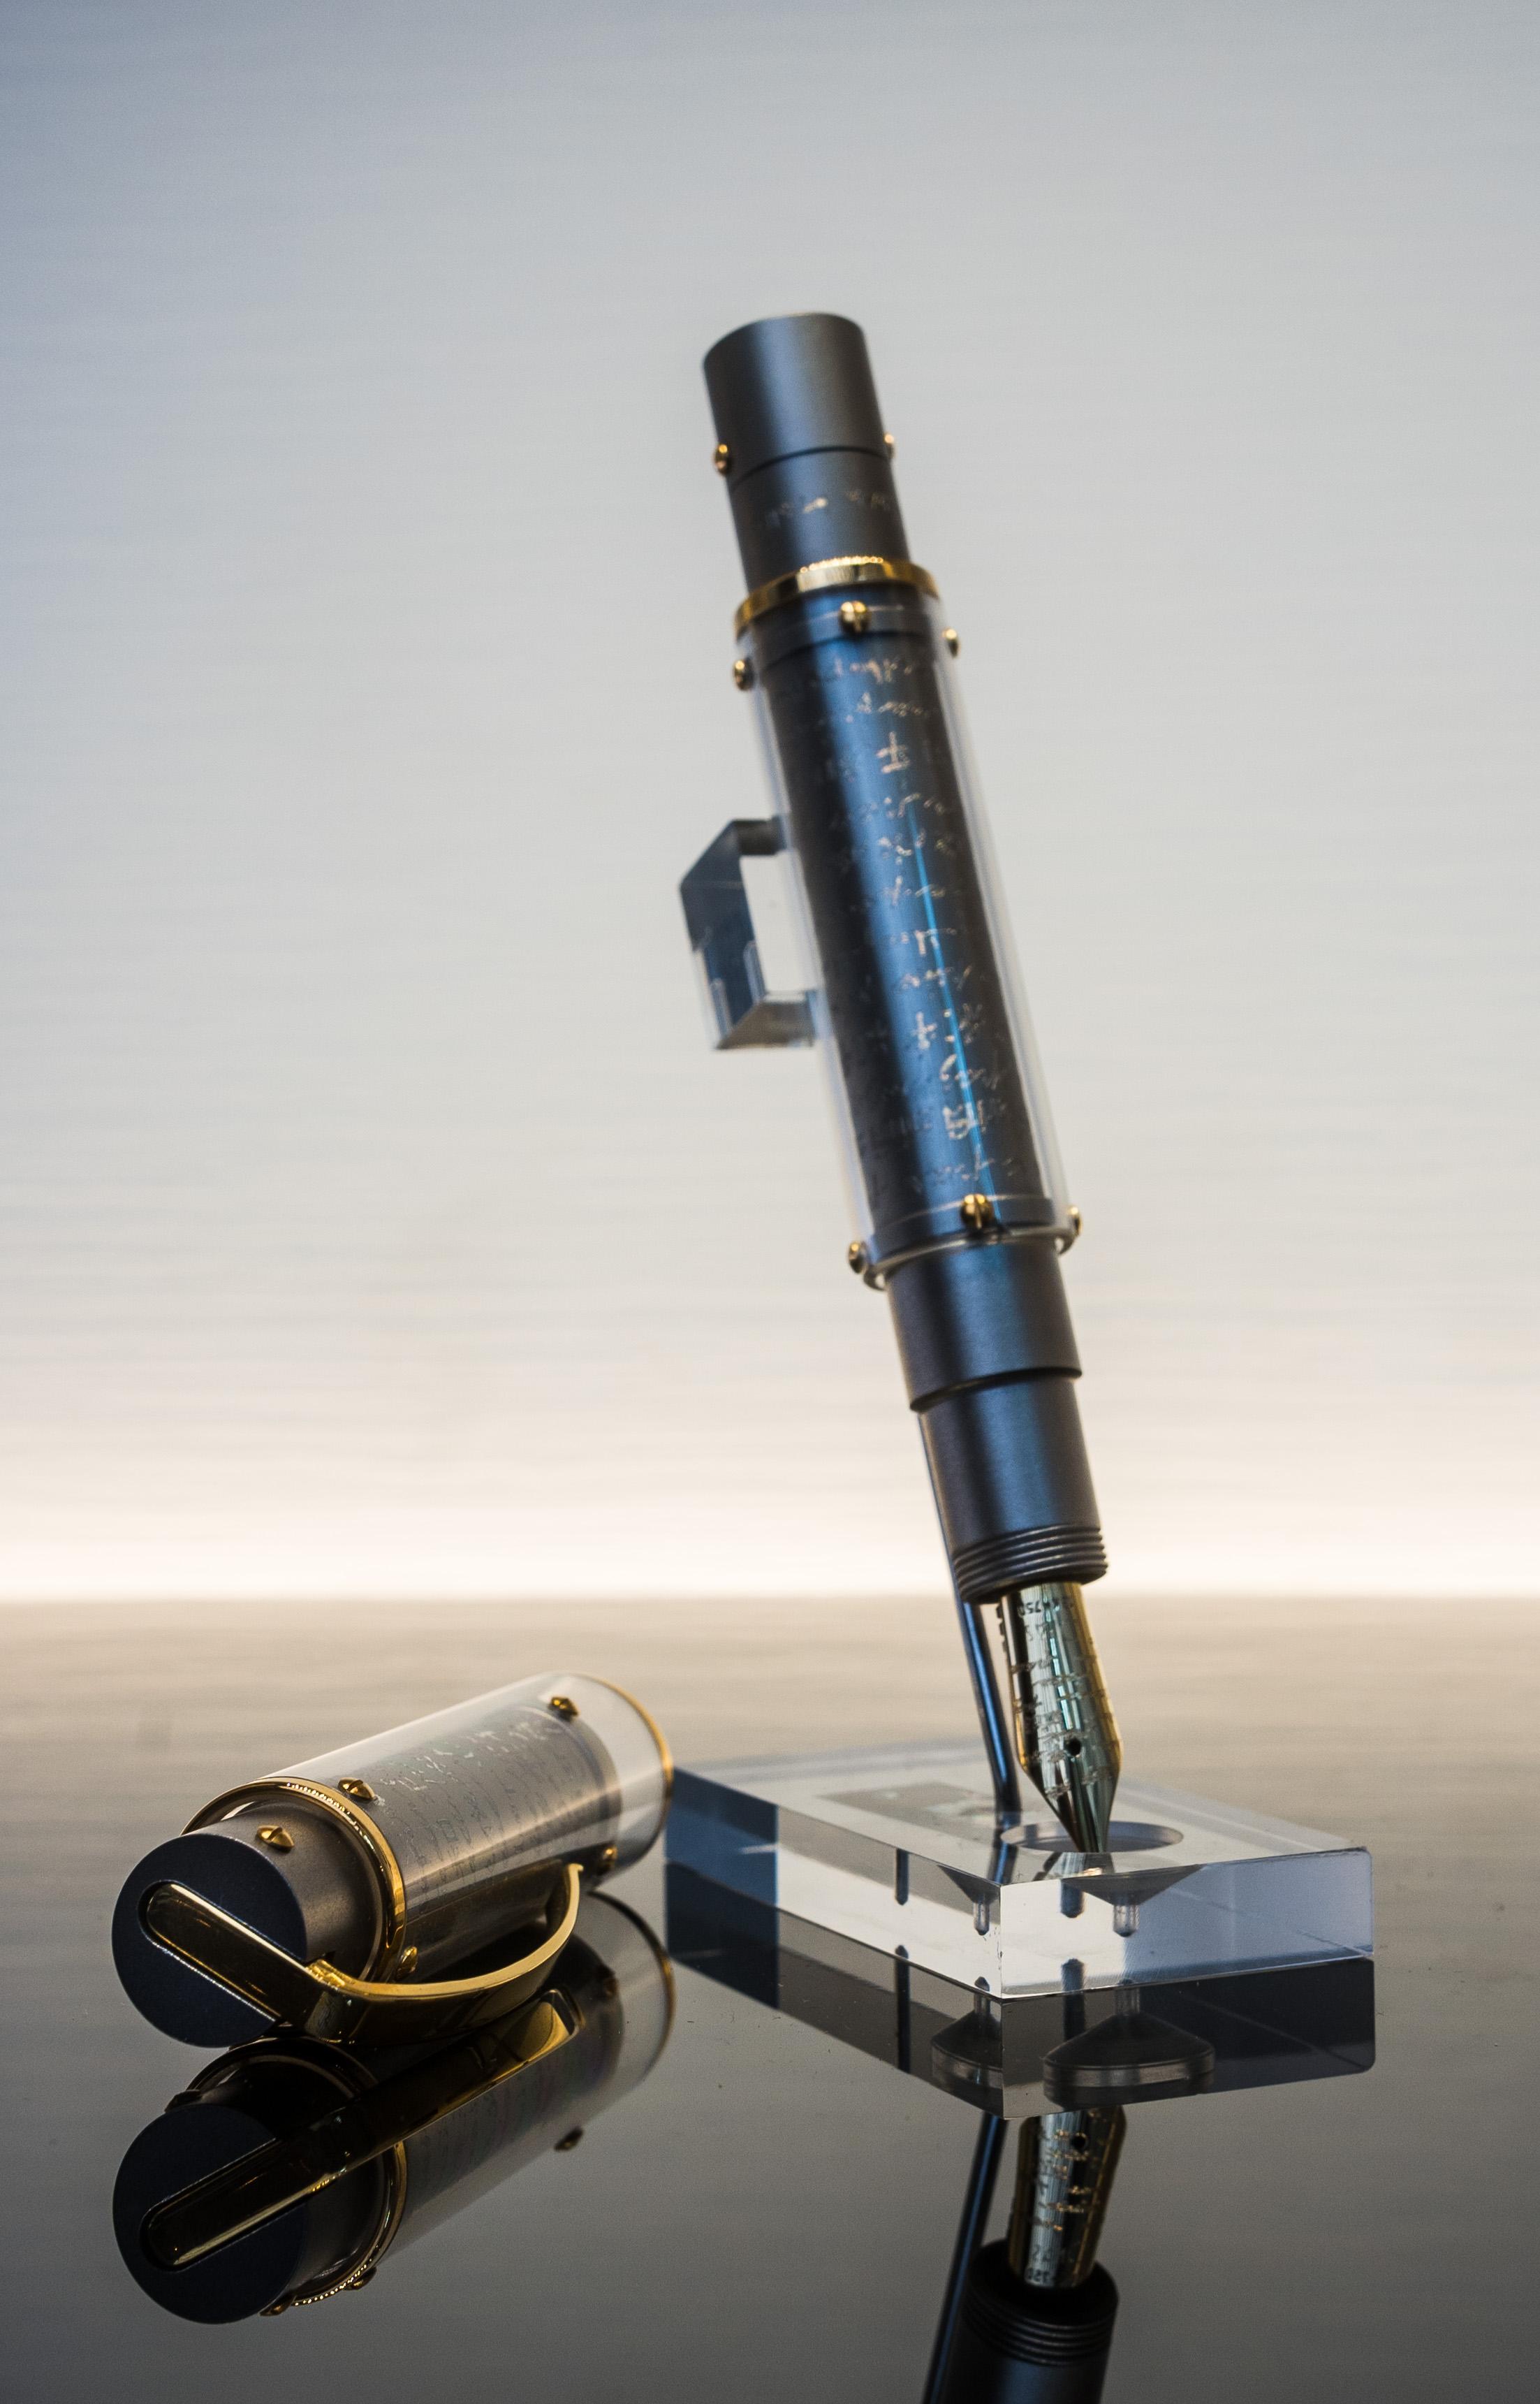 OMAS Harmonia Mundi Fountain Pen